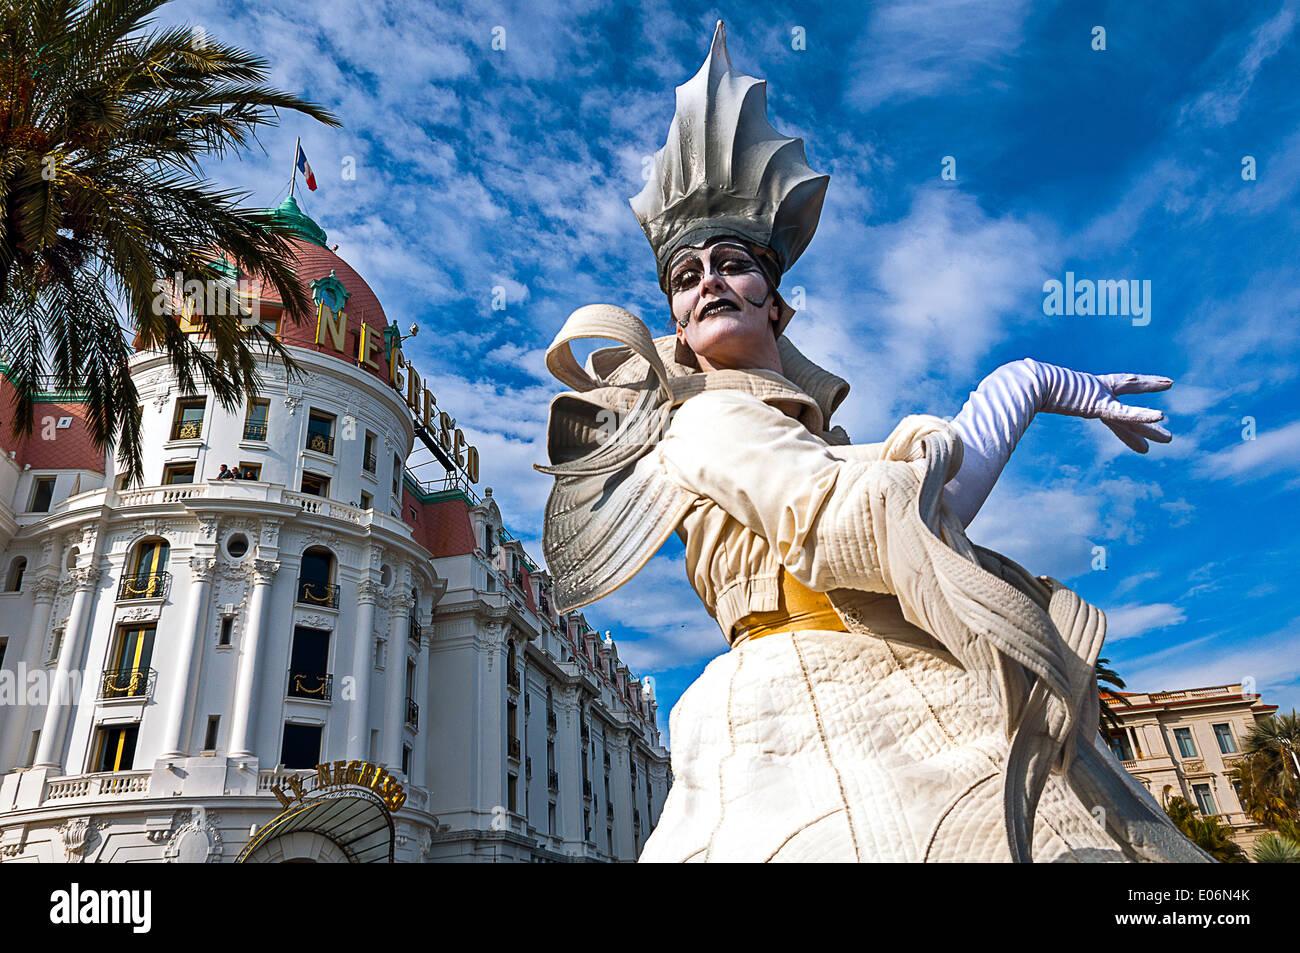 Europe, France, Alpes-Maritimes, Nice. Carnival. - Stock Image